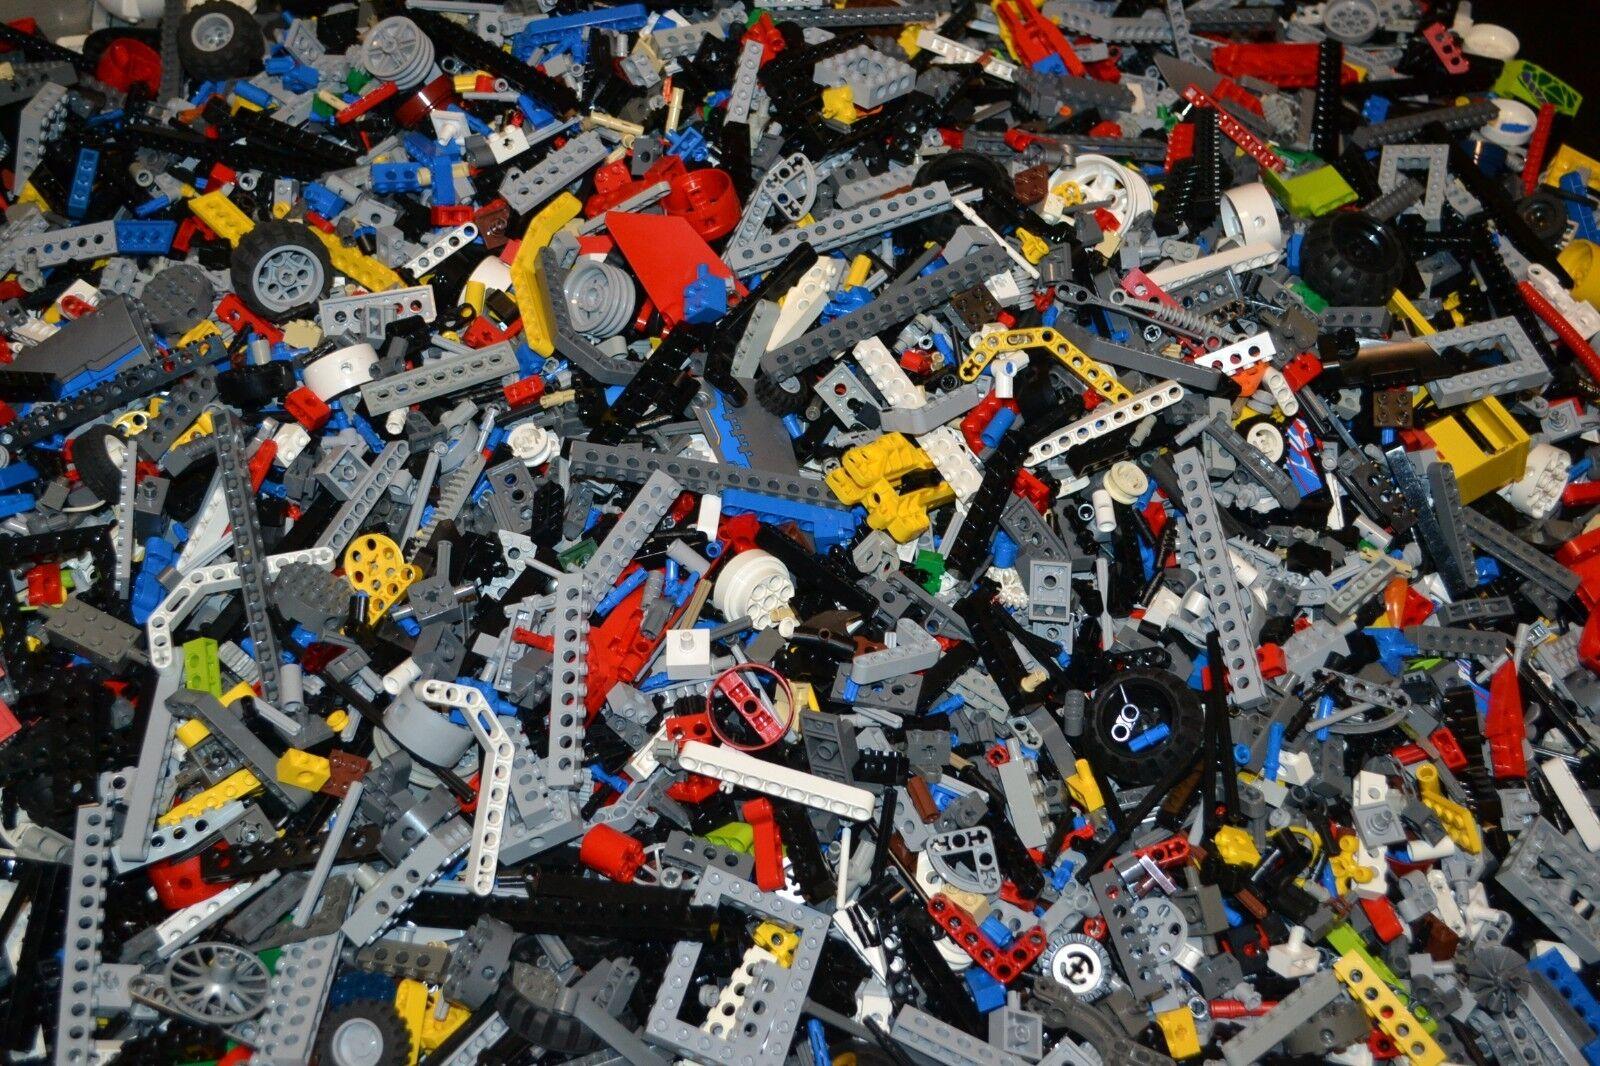 Lego TECHNIC Bulk Lot 1000 Random Pieces, Lift Arms, Gears & More - A2